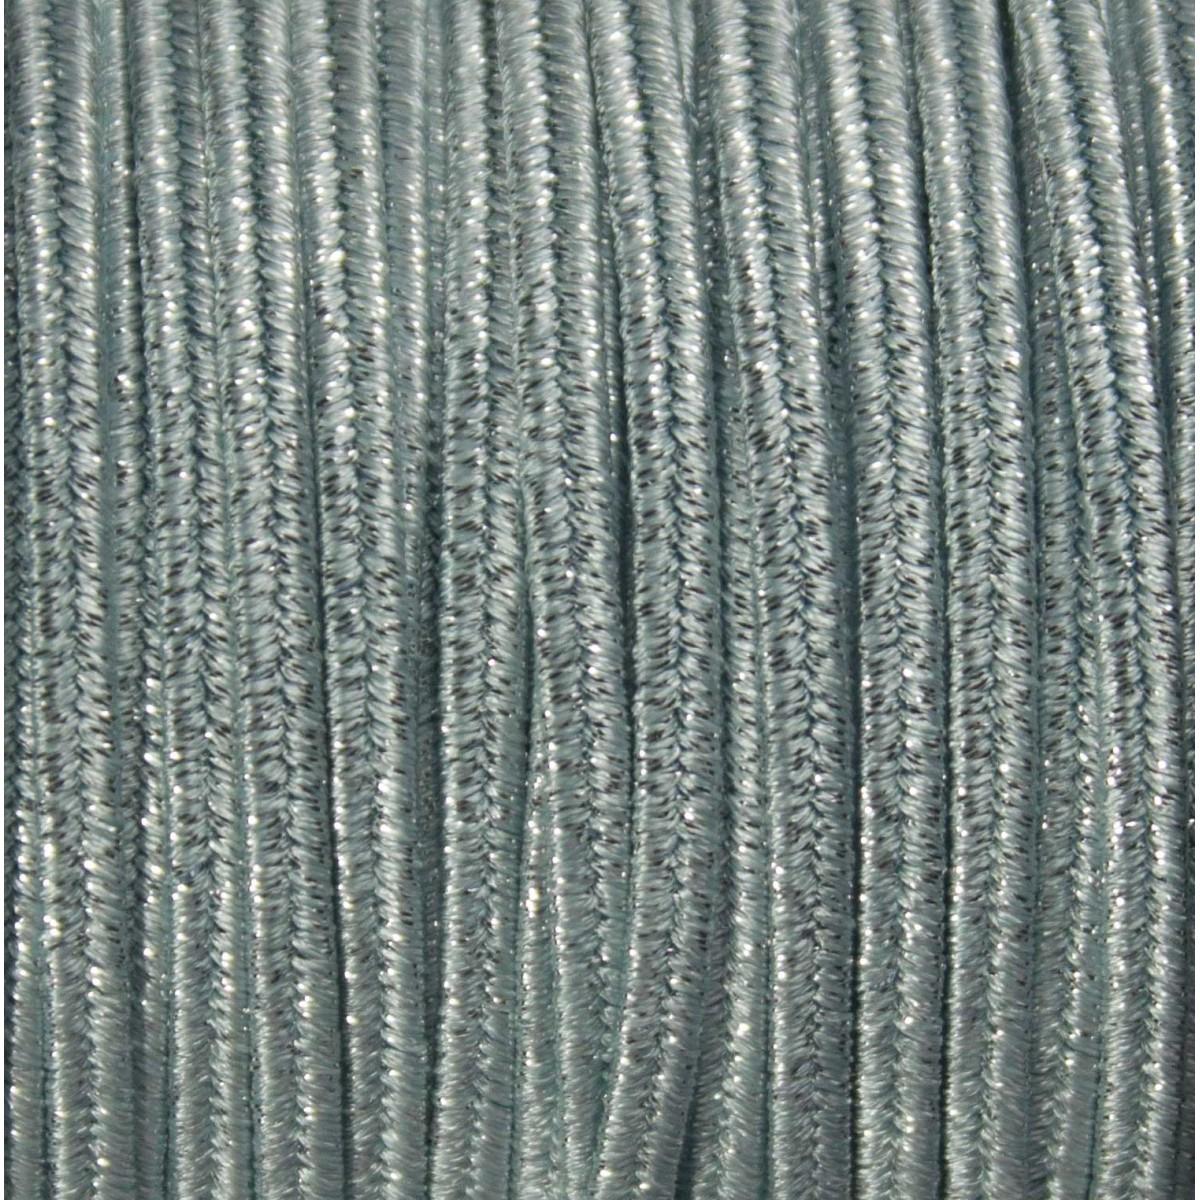 Cordoncino Soutache Metallico mm 4,0 Metal Azore x 3 mt